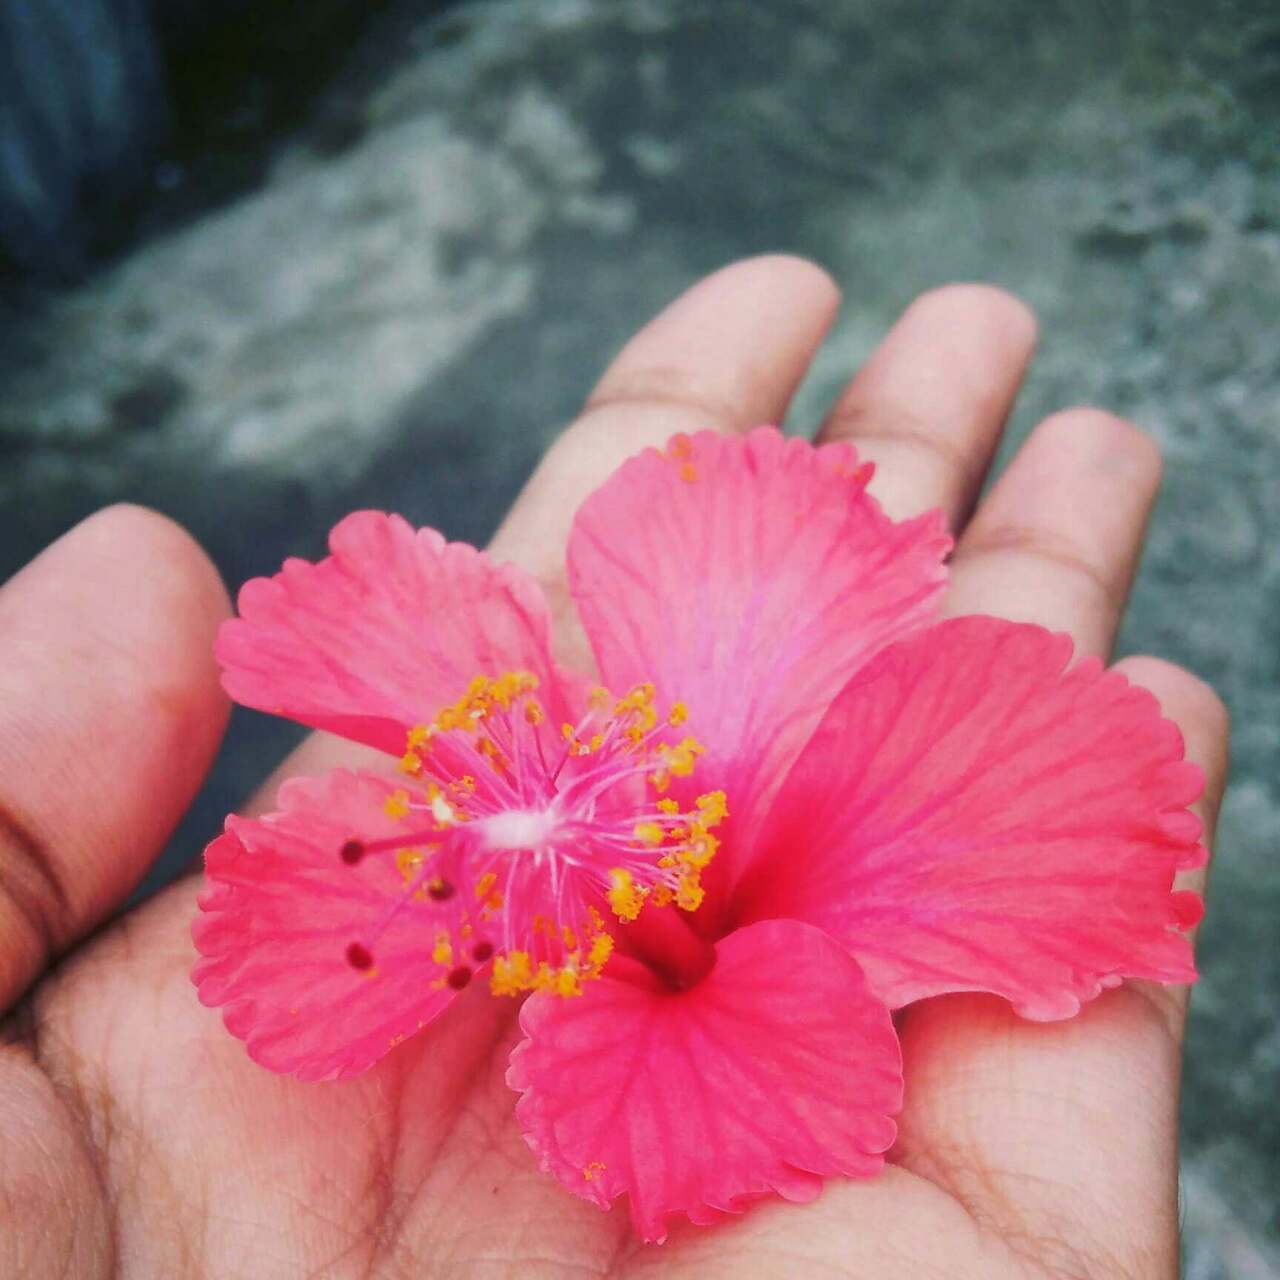 Nojoto Nojotophotography Hibiscus Flower Love Tst Infinite